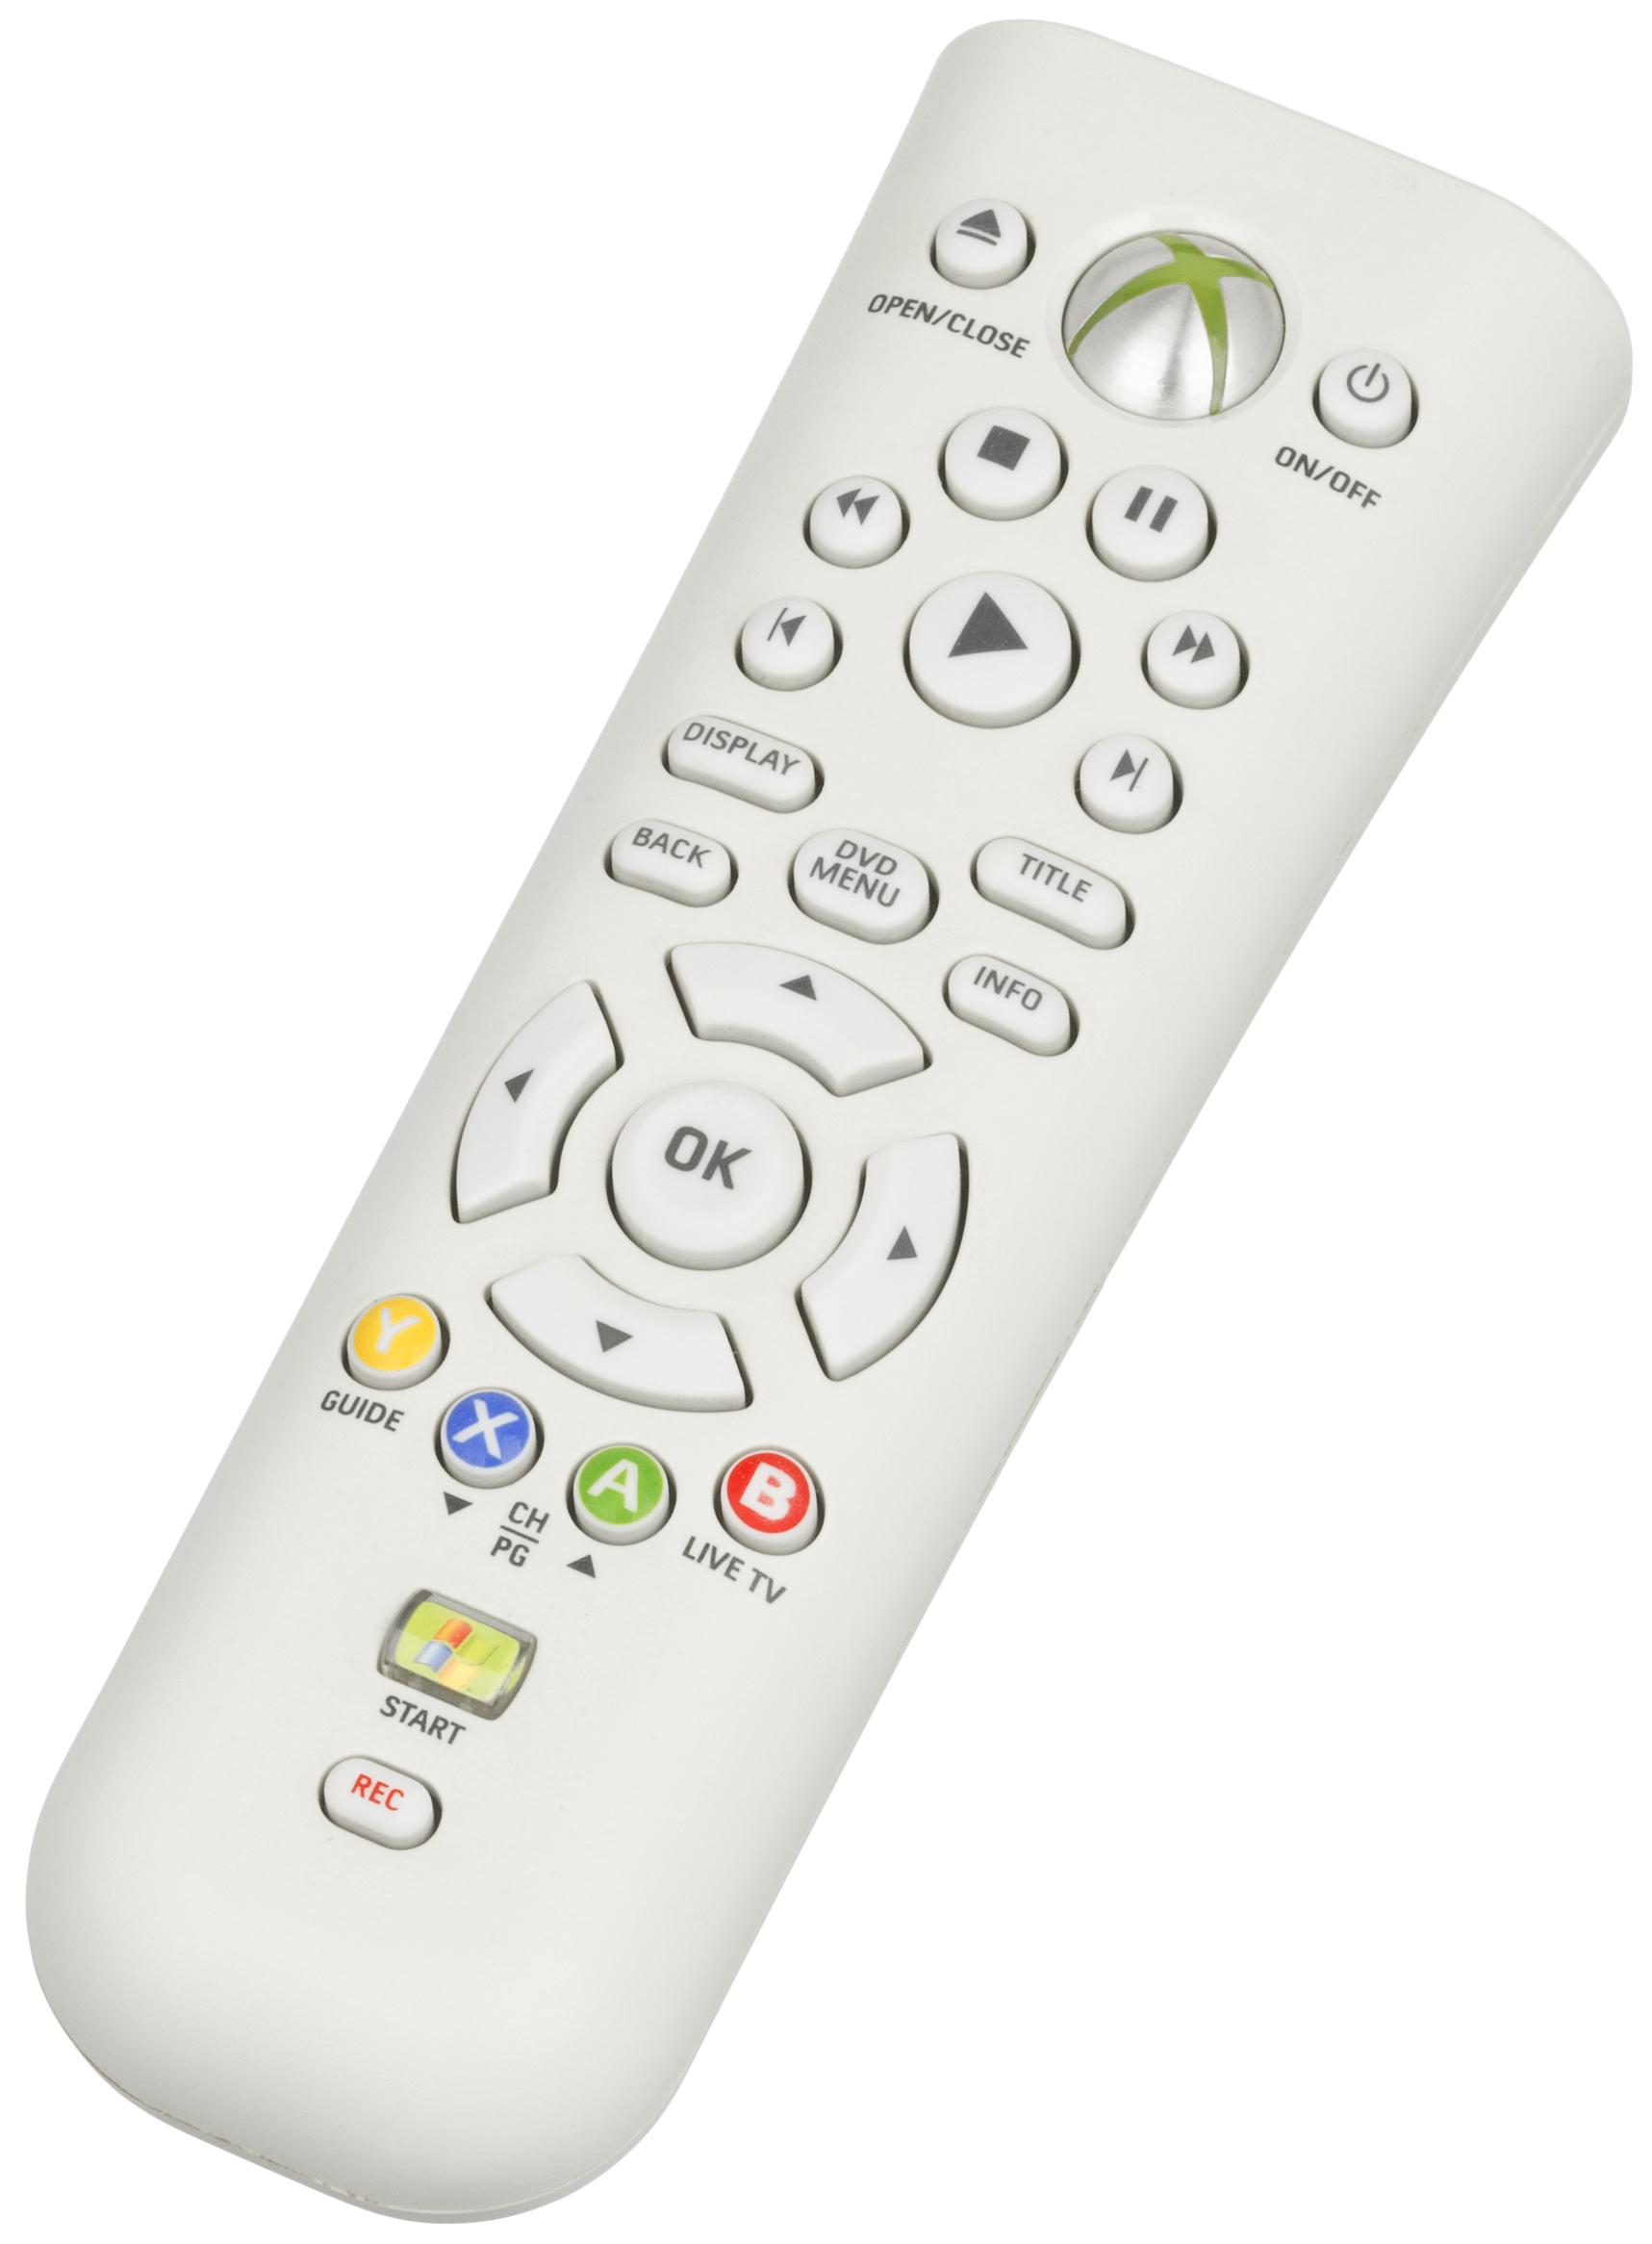 Filemicrosoft Xbox 360 Remote Control White Shortg Wikimedia